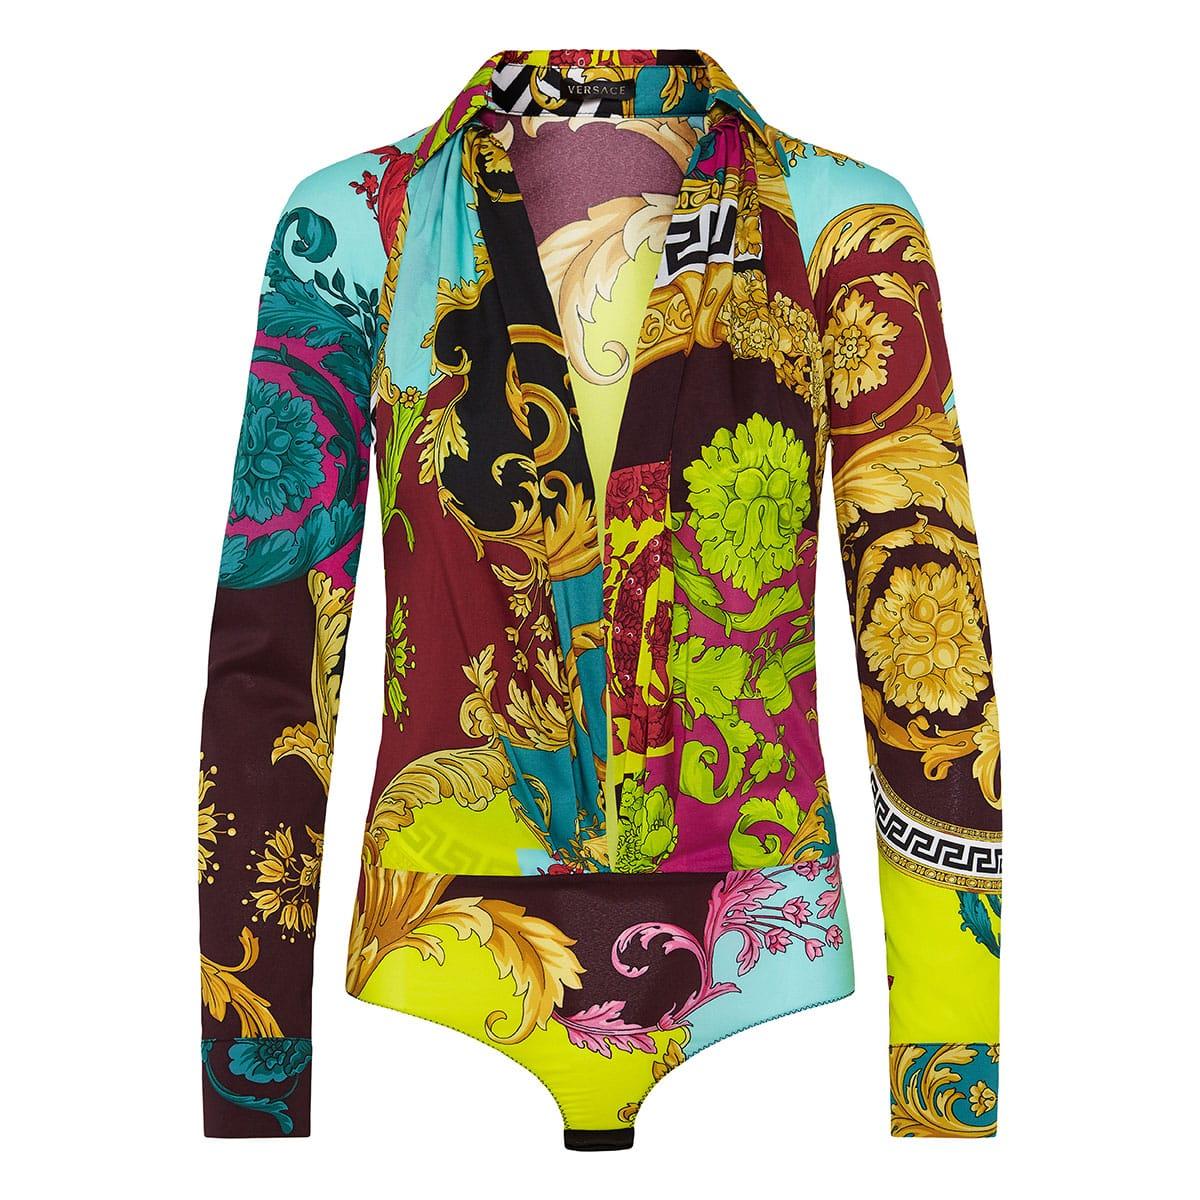 Montage-print bodysuit